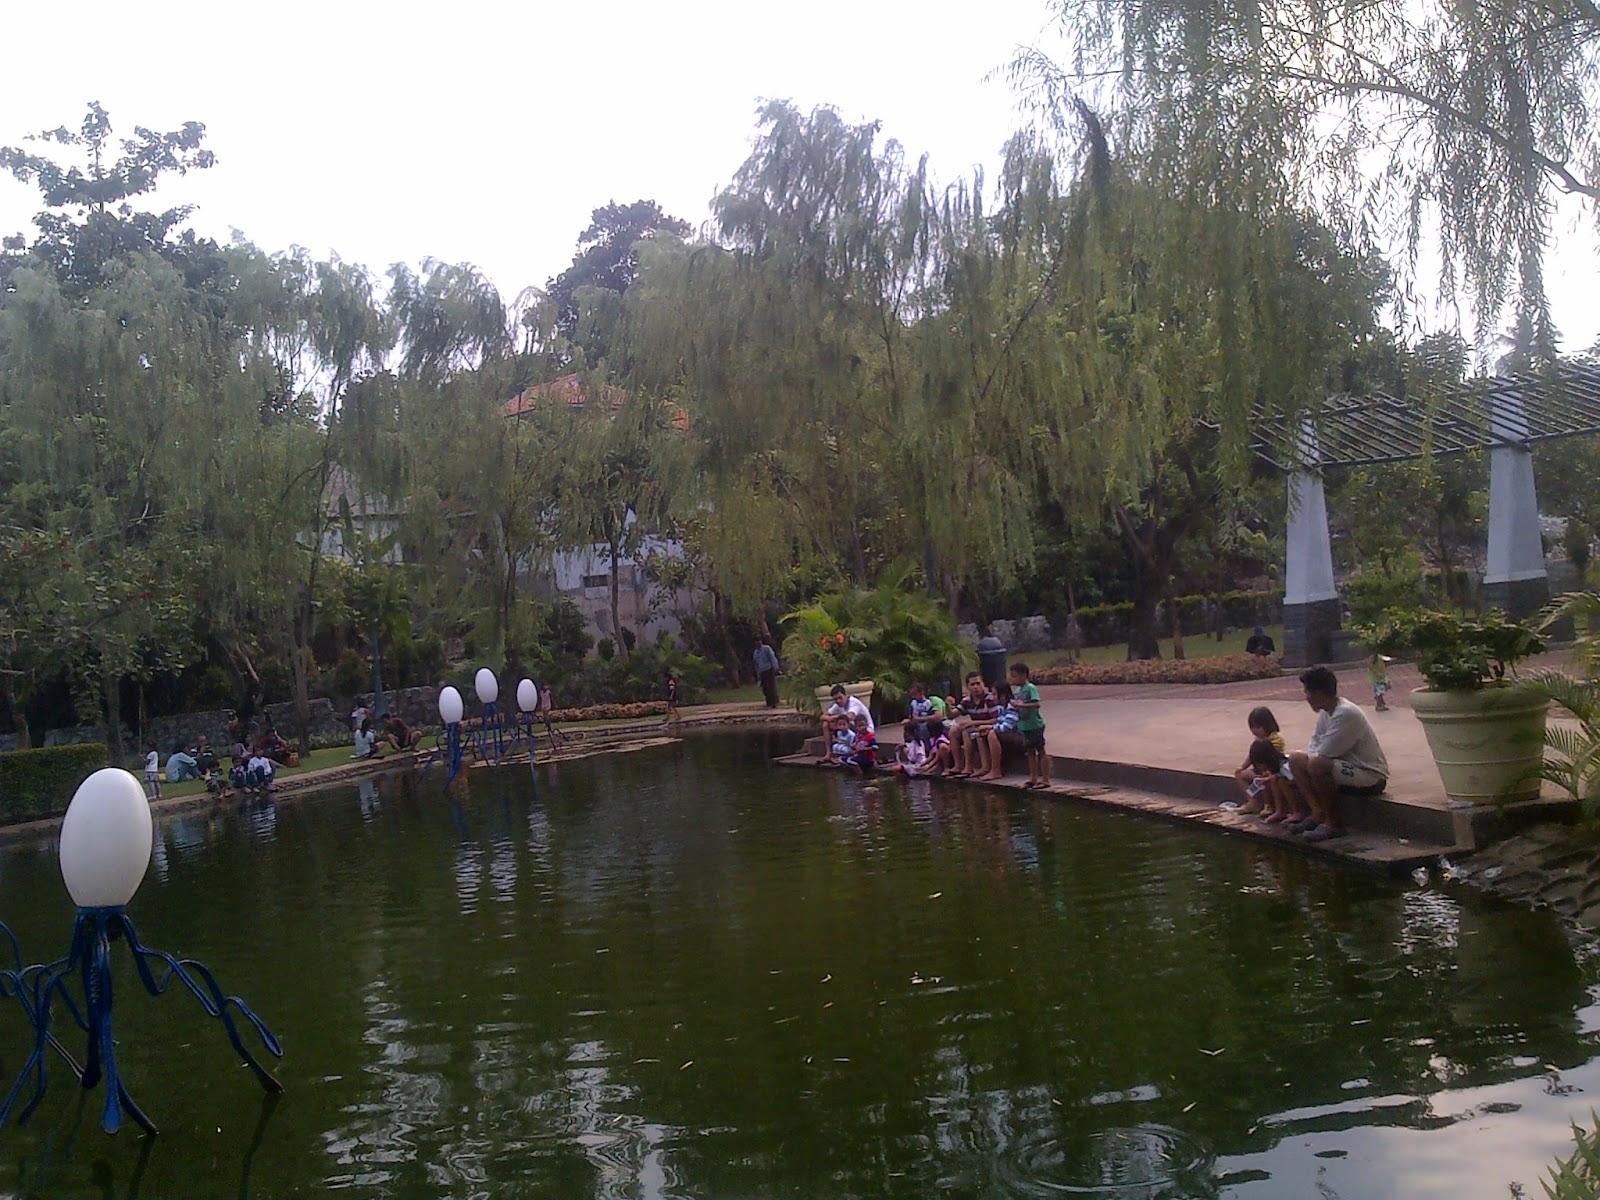 Ajang Sauh Rasa Januari 2015 Taman Seluas 1 5 Hektar